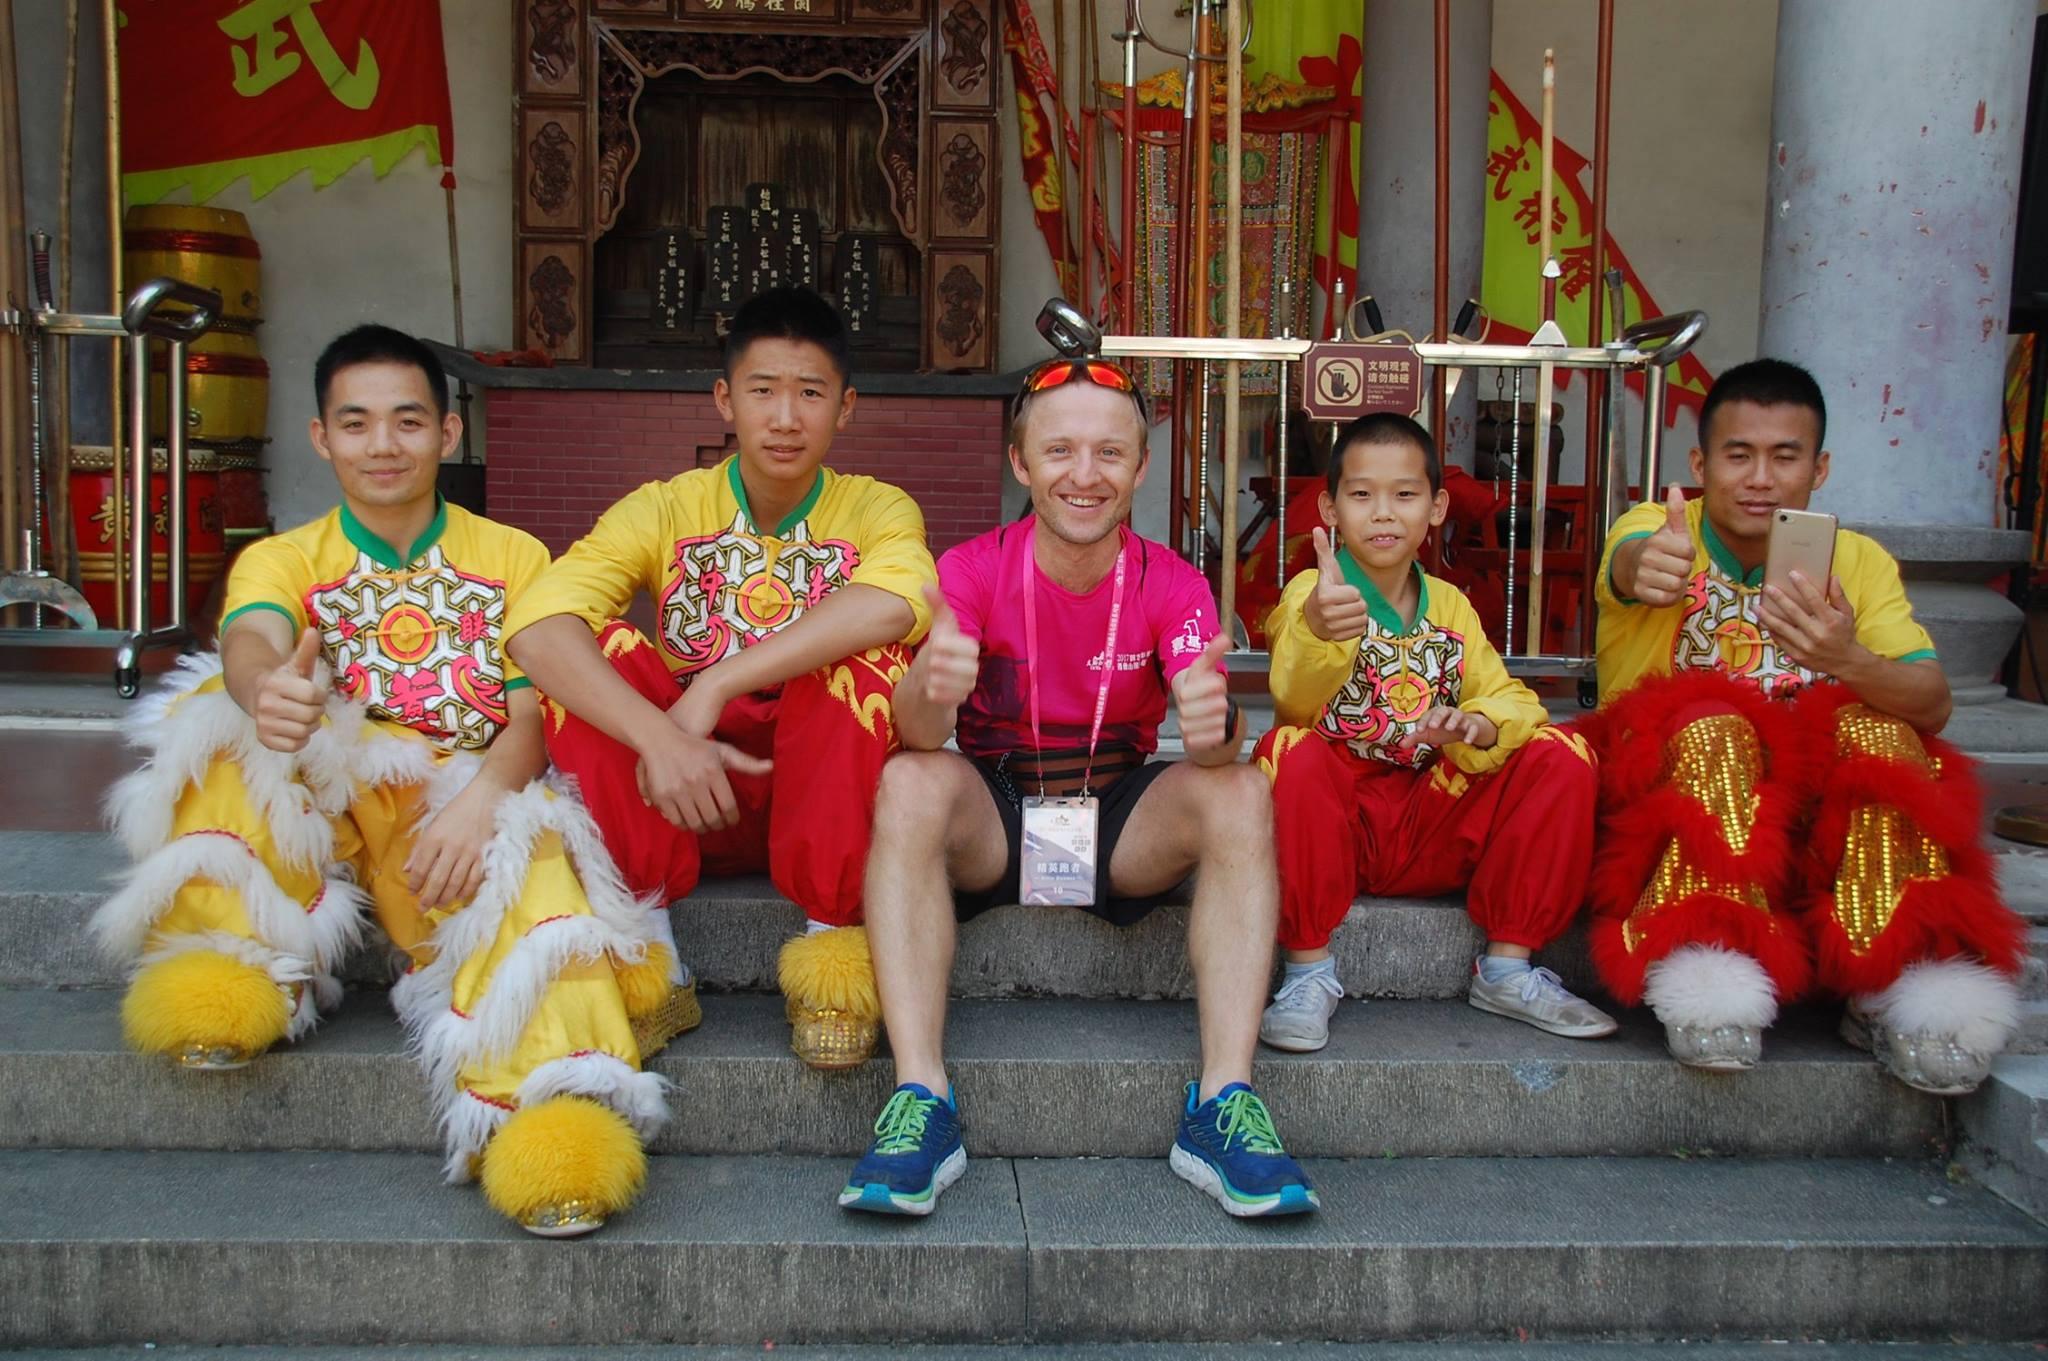 Fot: Archiwum Łukasza -Xiqiao Mountain International- 4hr Ultramaratho. Chiny 2017